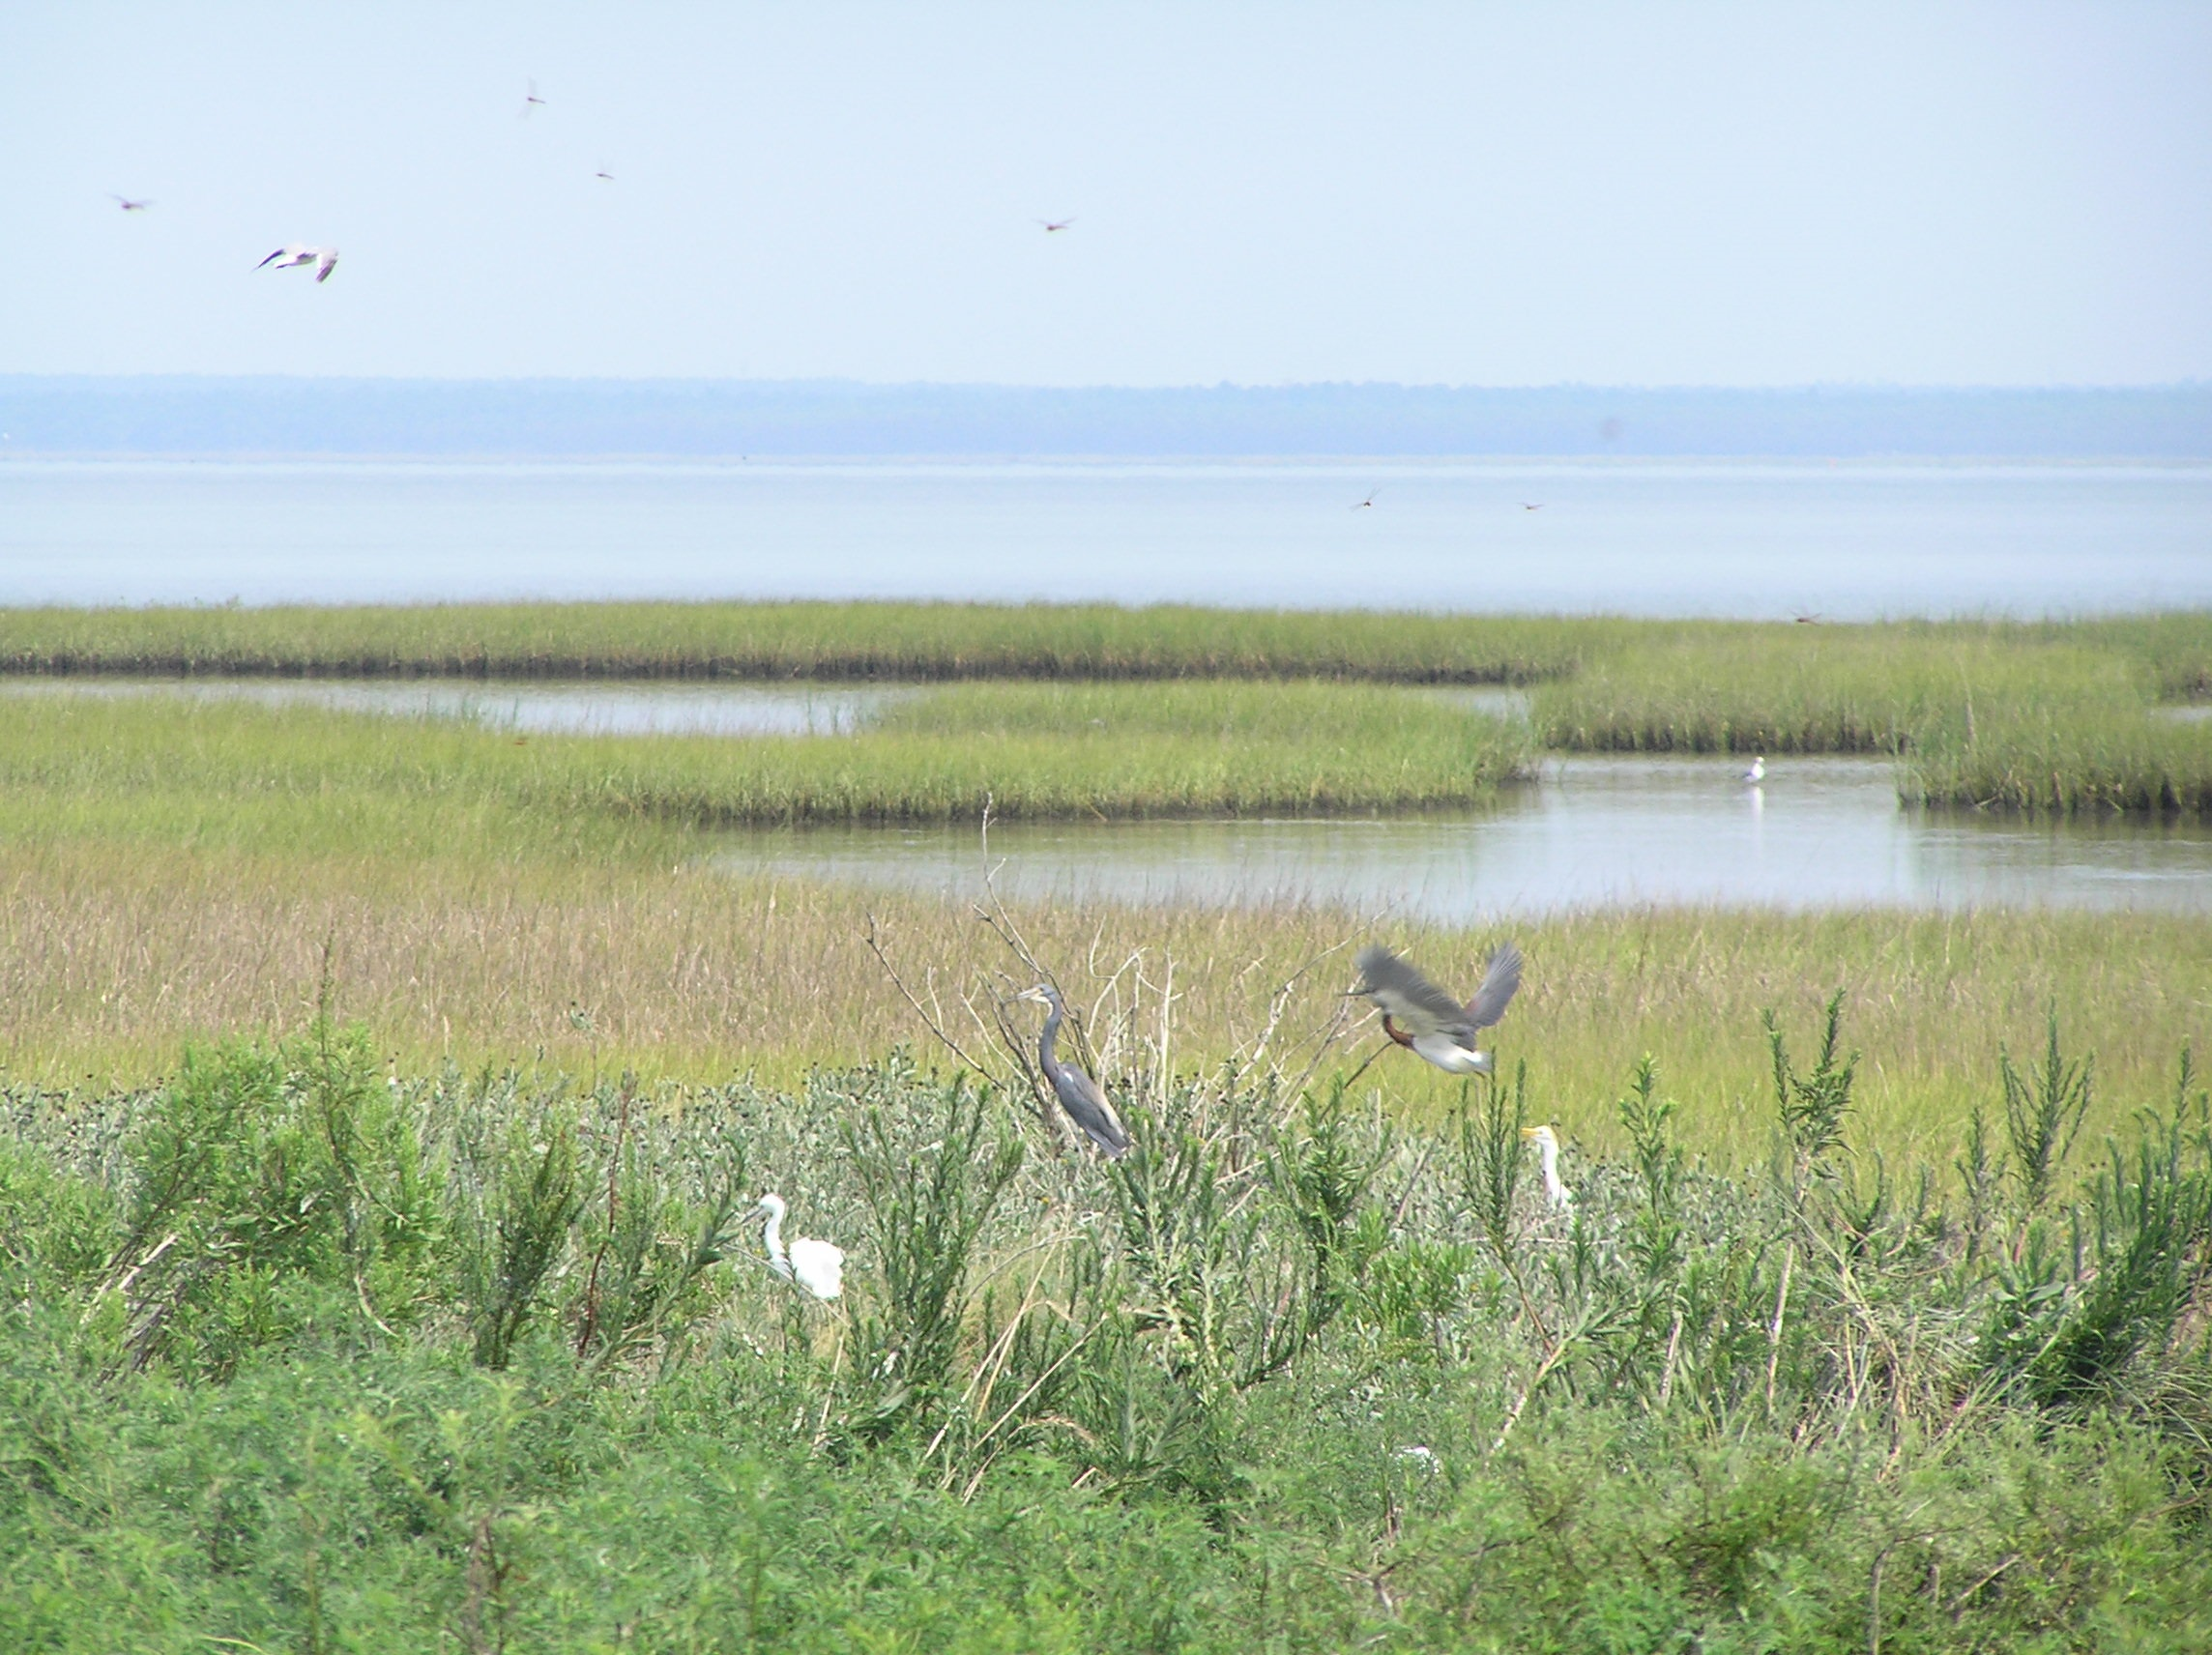 Alabama Trustee Implementation Group Begins Drafting its Second Restoration Plan